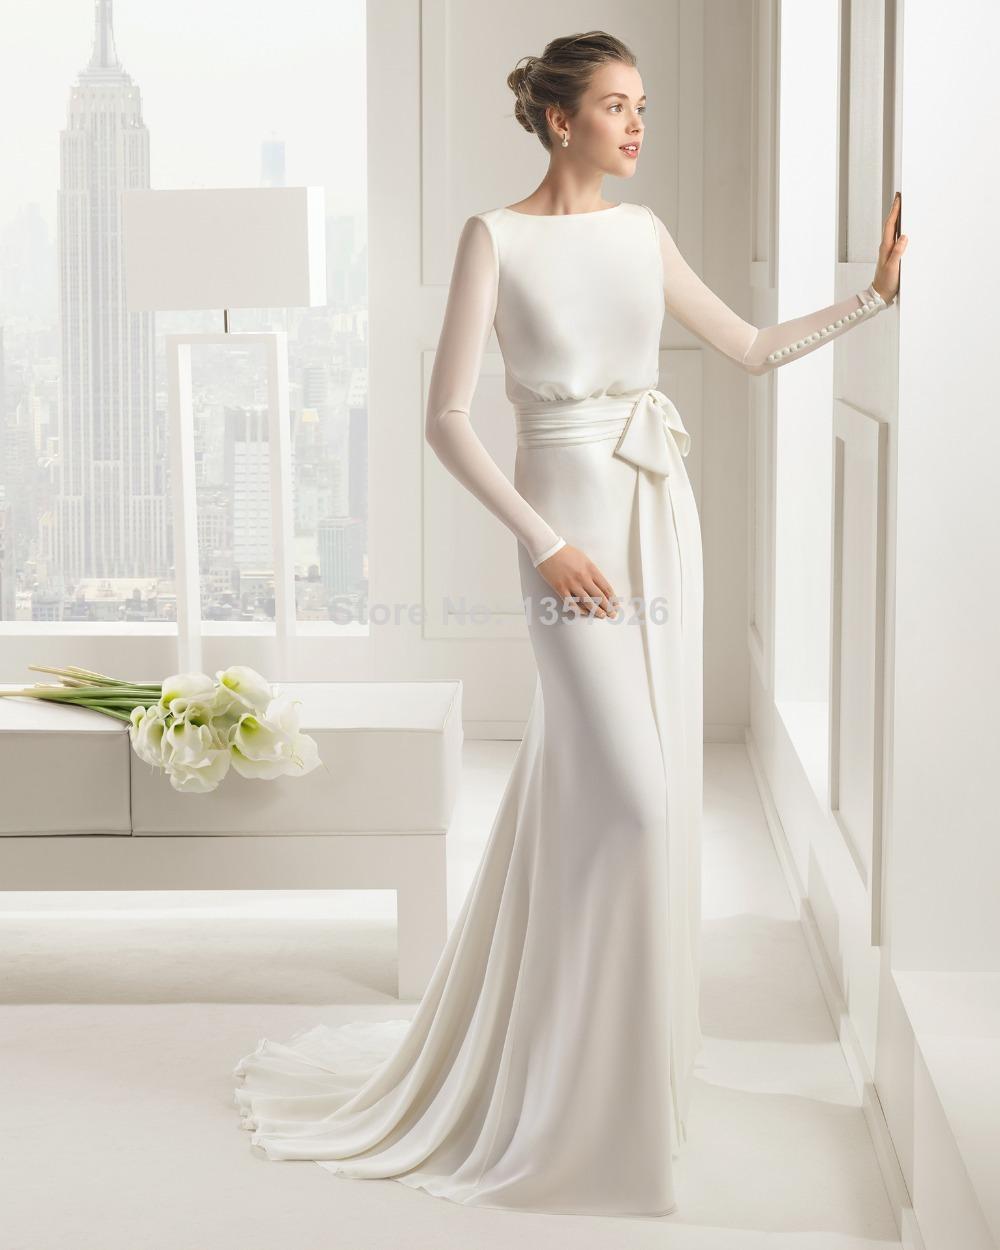 Latest Design Long Sleeve Bridal Gowns 2015 Sheath Chiffon